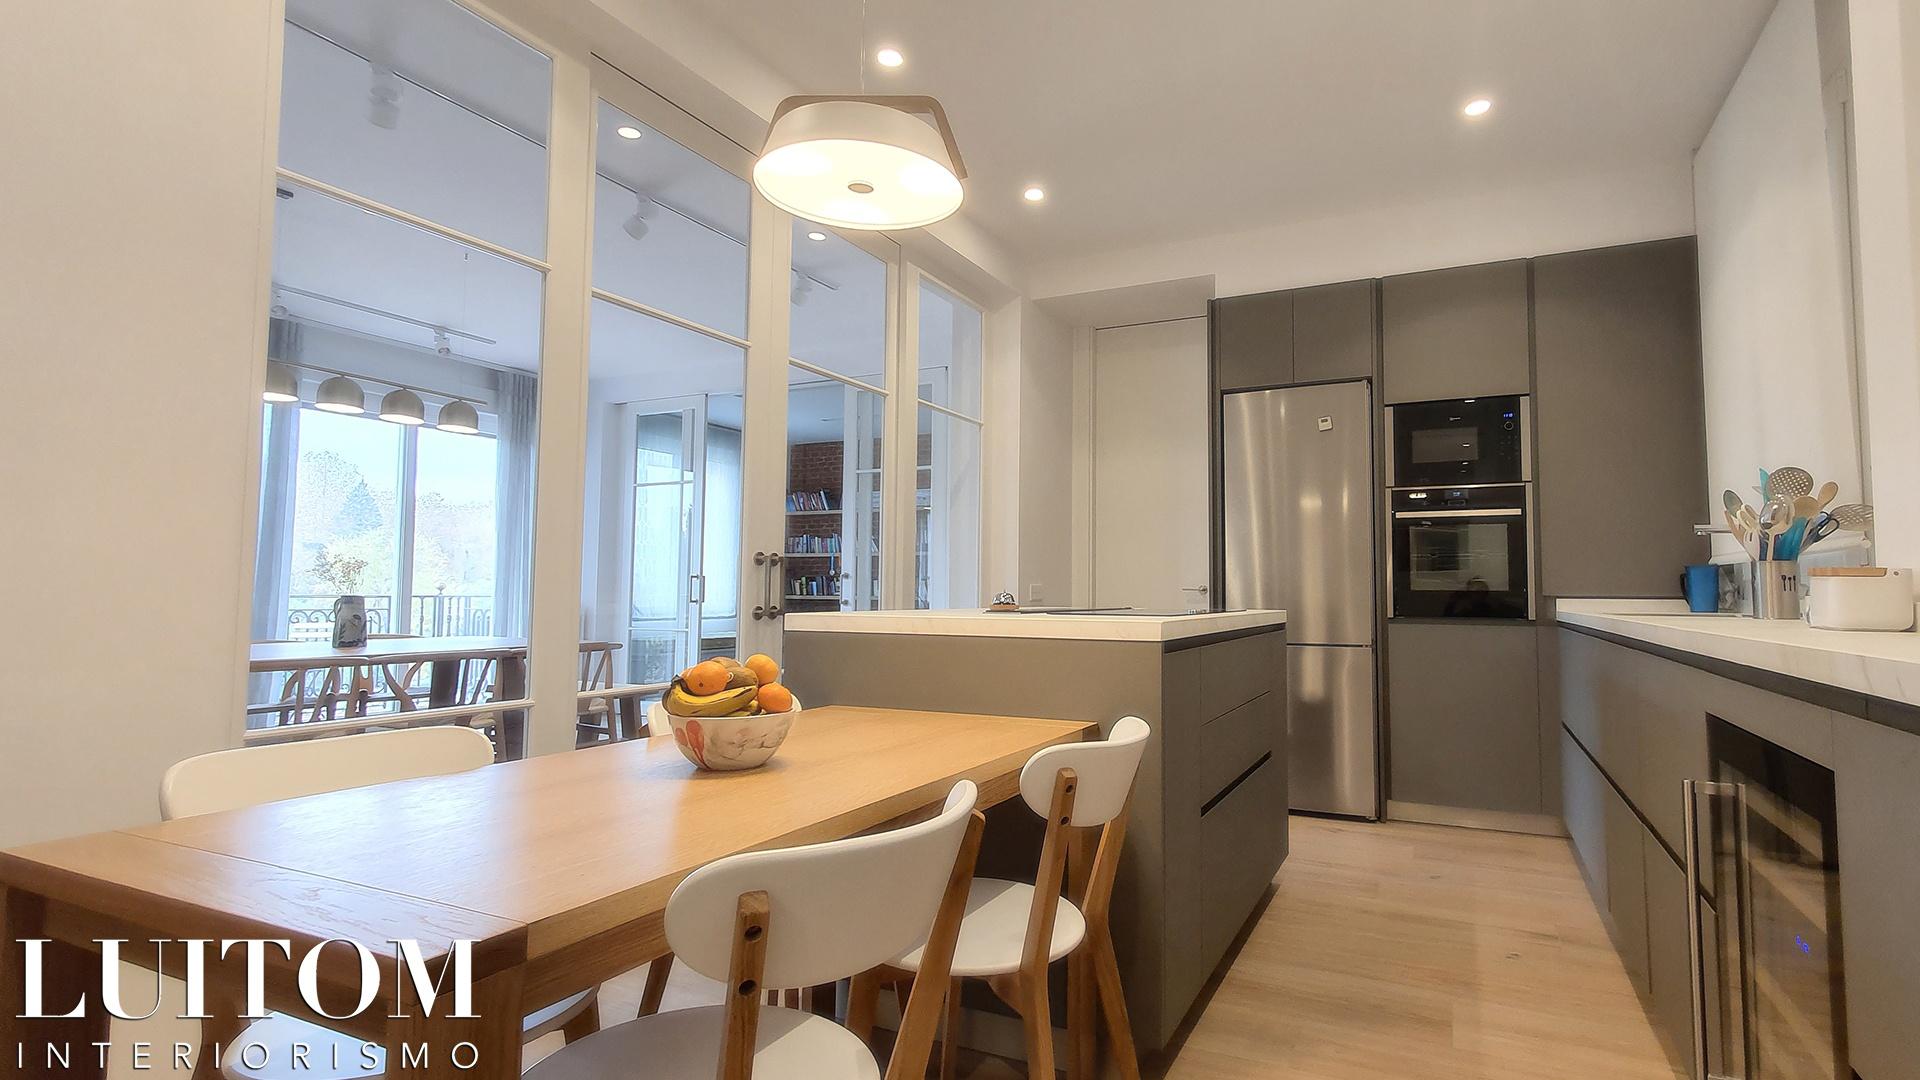 cristaleras-cocinas-pared-cristal-separacion-cocina-salon-cristalera-metalica-madera-blanca-negra-07